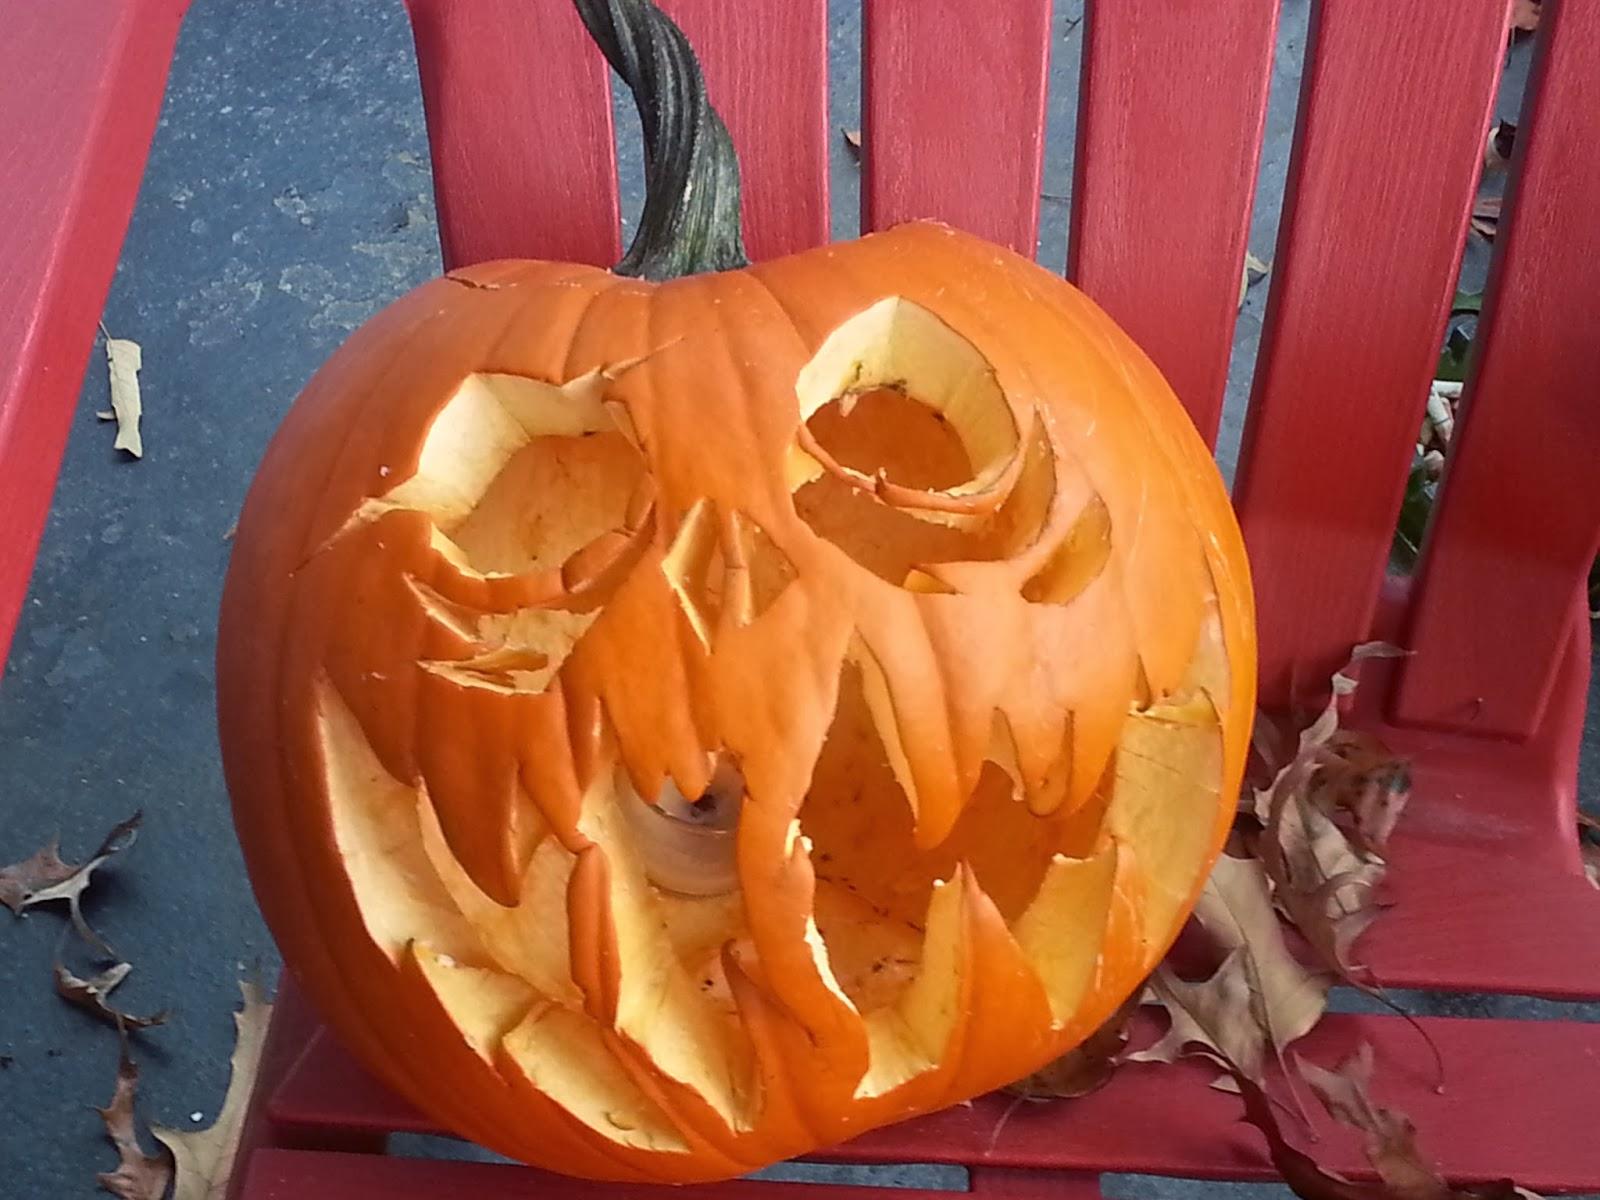 Mysterious Halloween Jack-o-lantern | Navigating Hectivity by Micki Bare